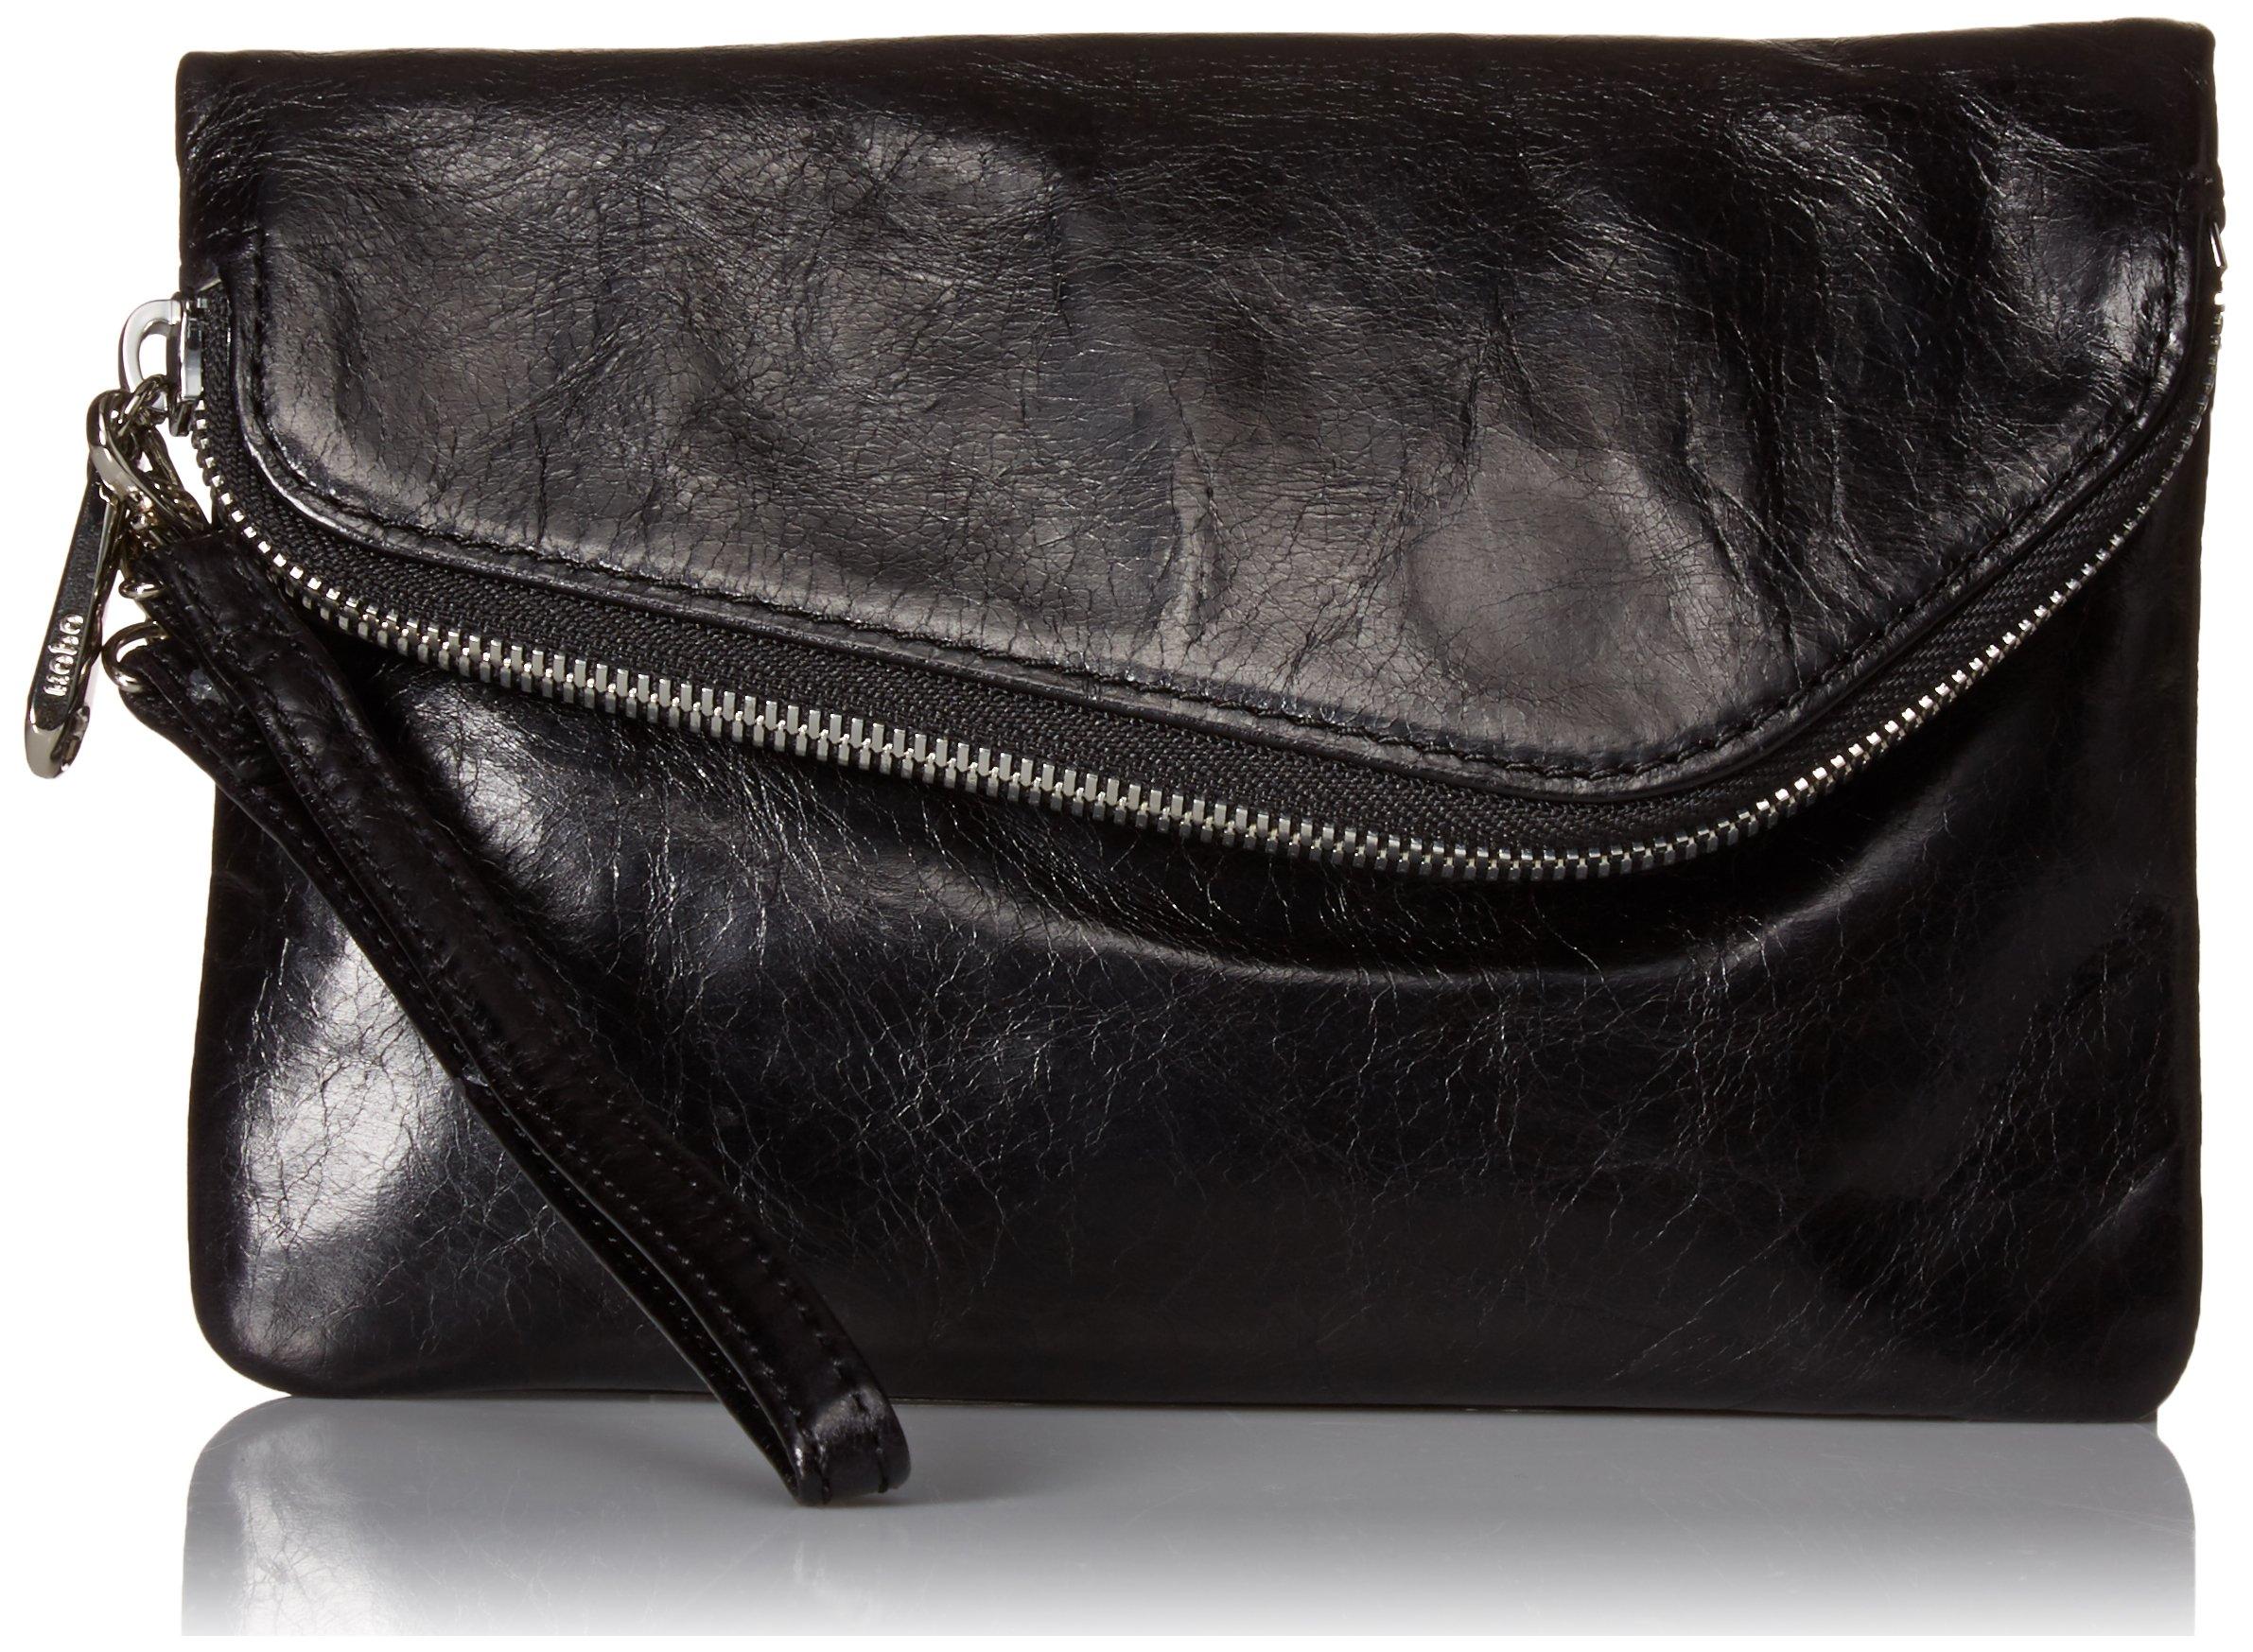 HOBO Vintage Daria Convertible Cross-Body Handbag,Black,one size